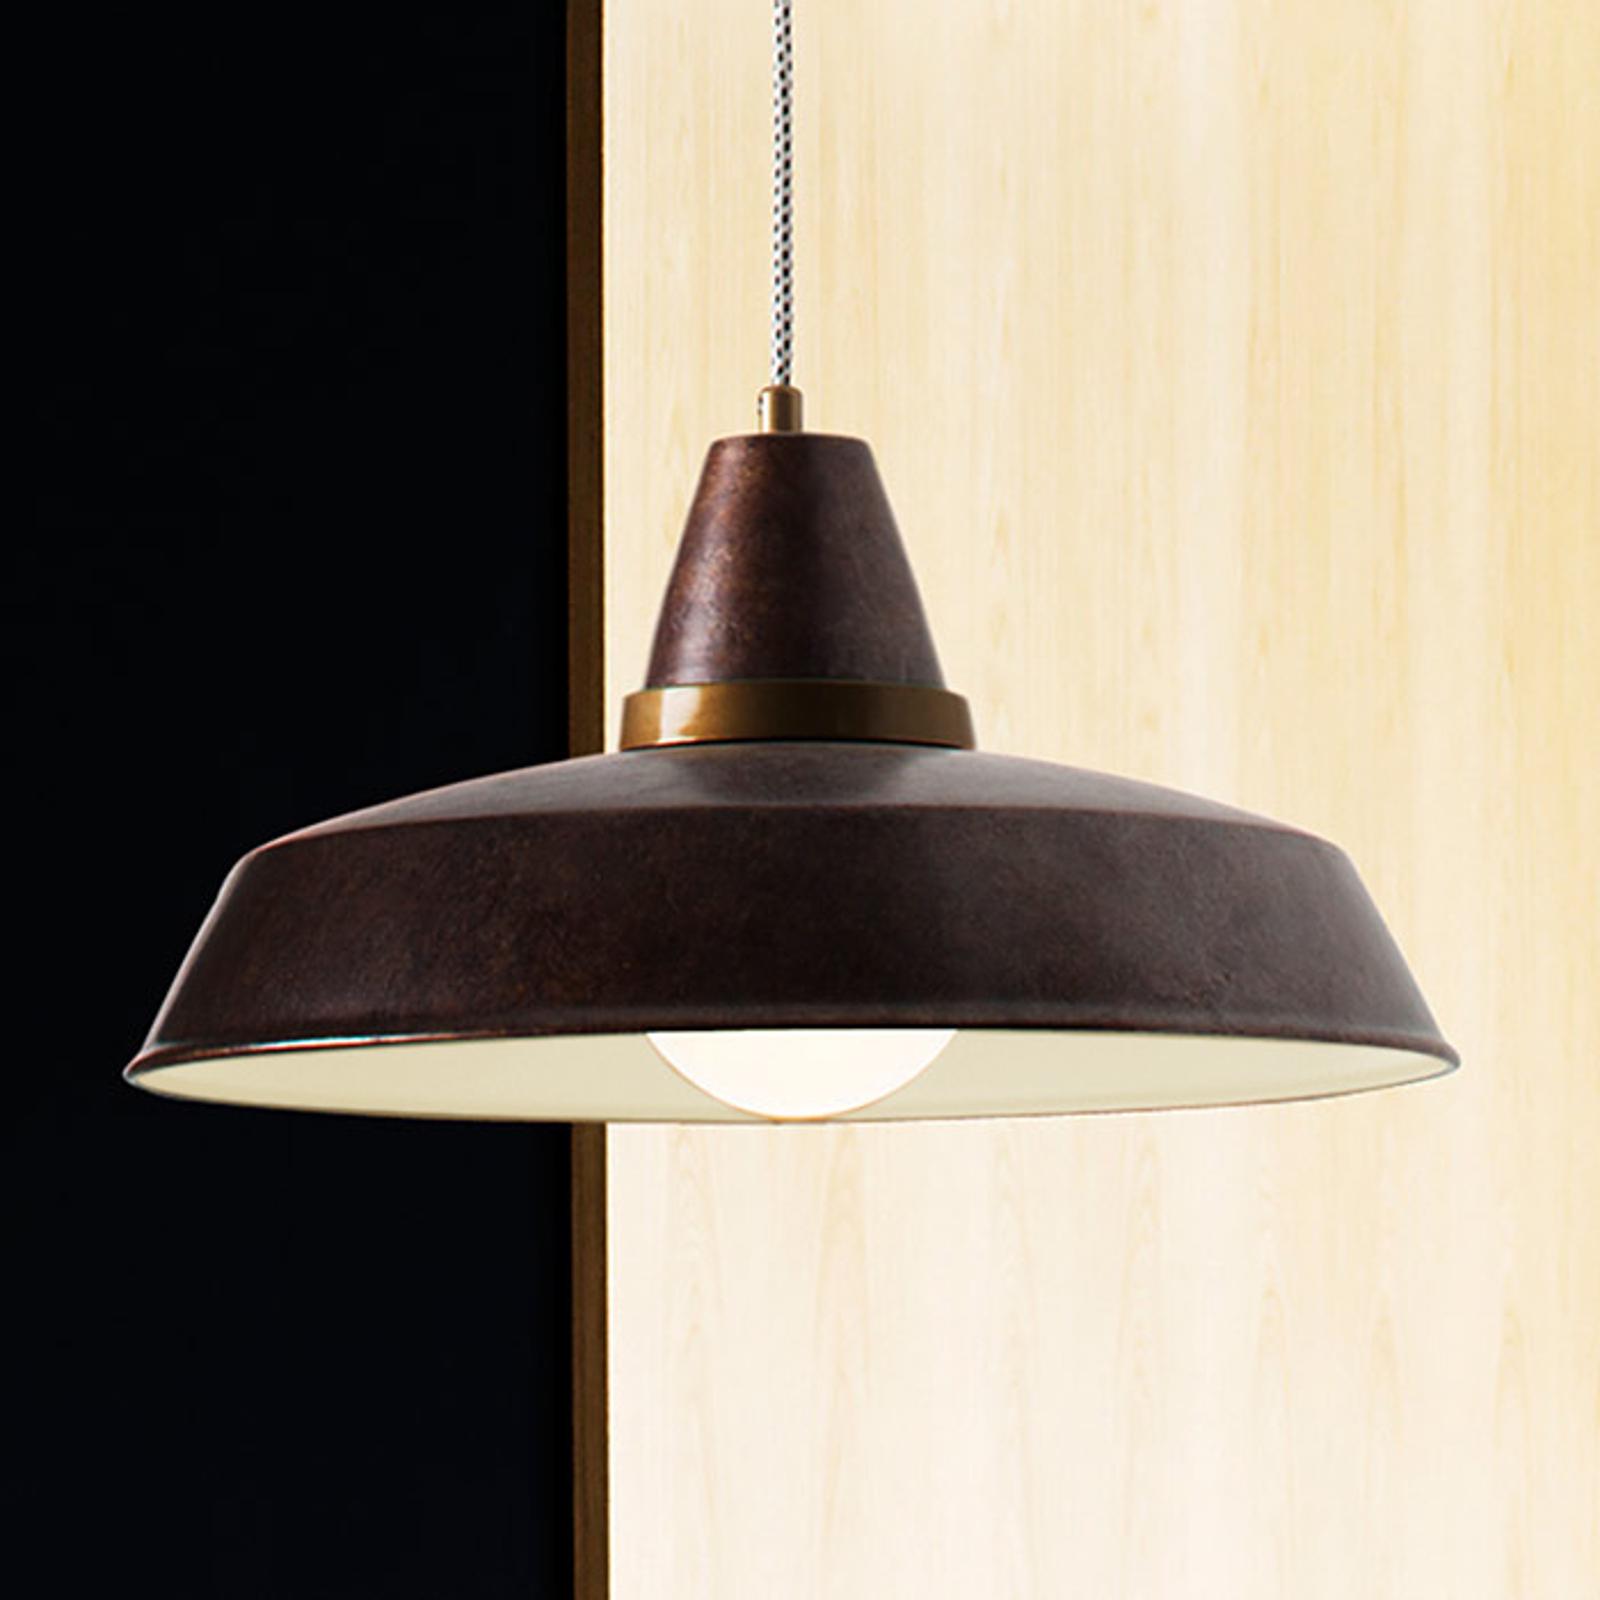 Suspension design Vintage rouille 1 lampe